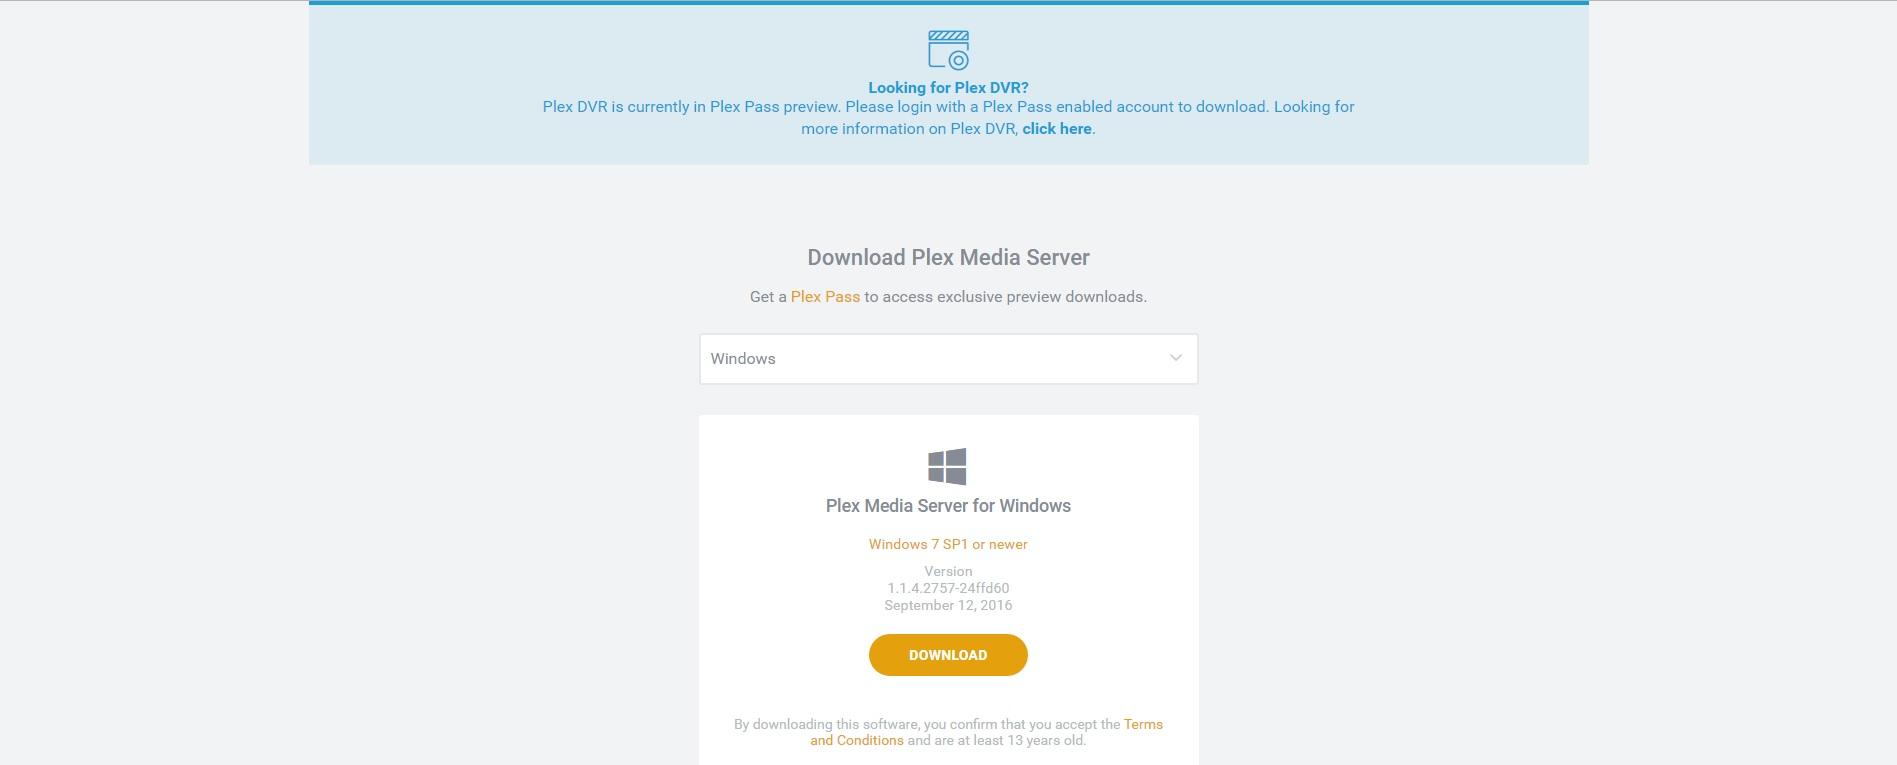 Plex download page